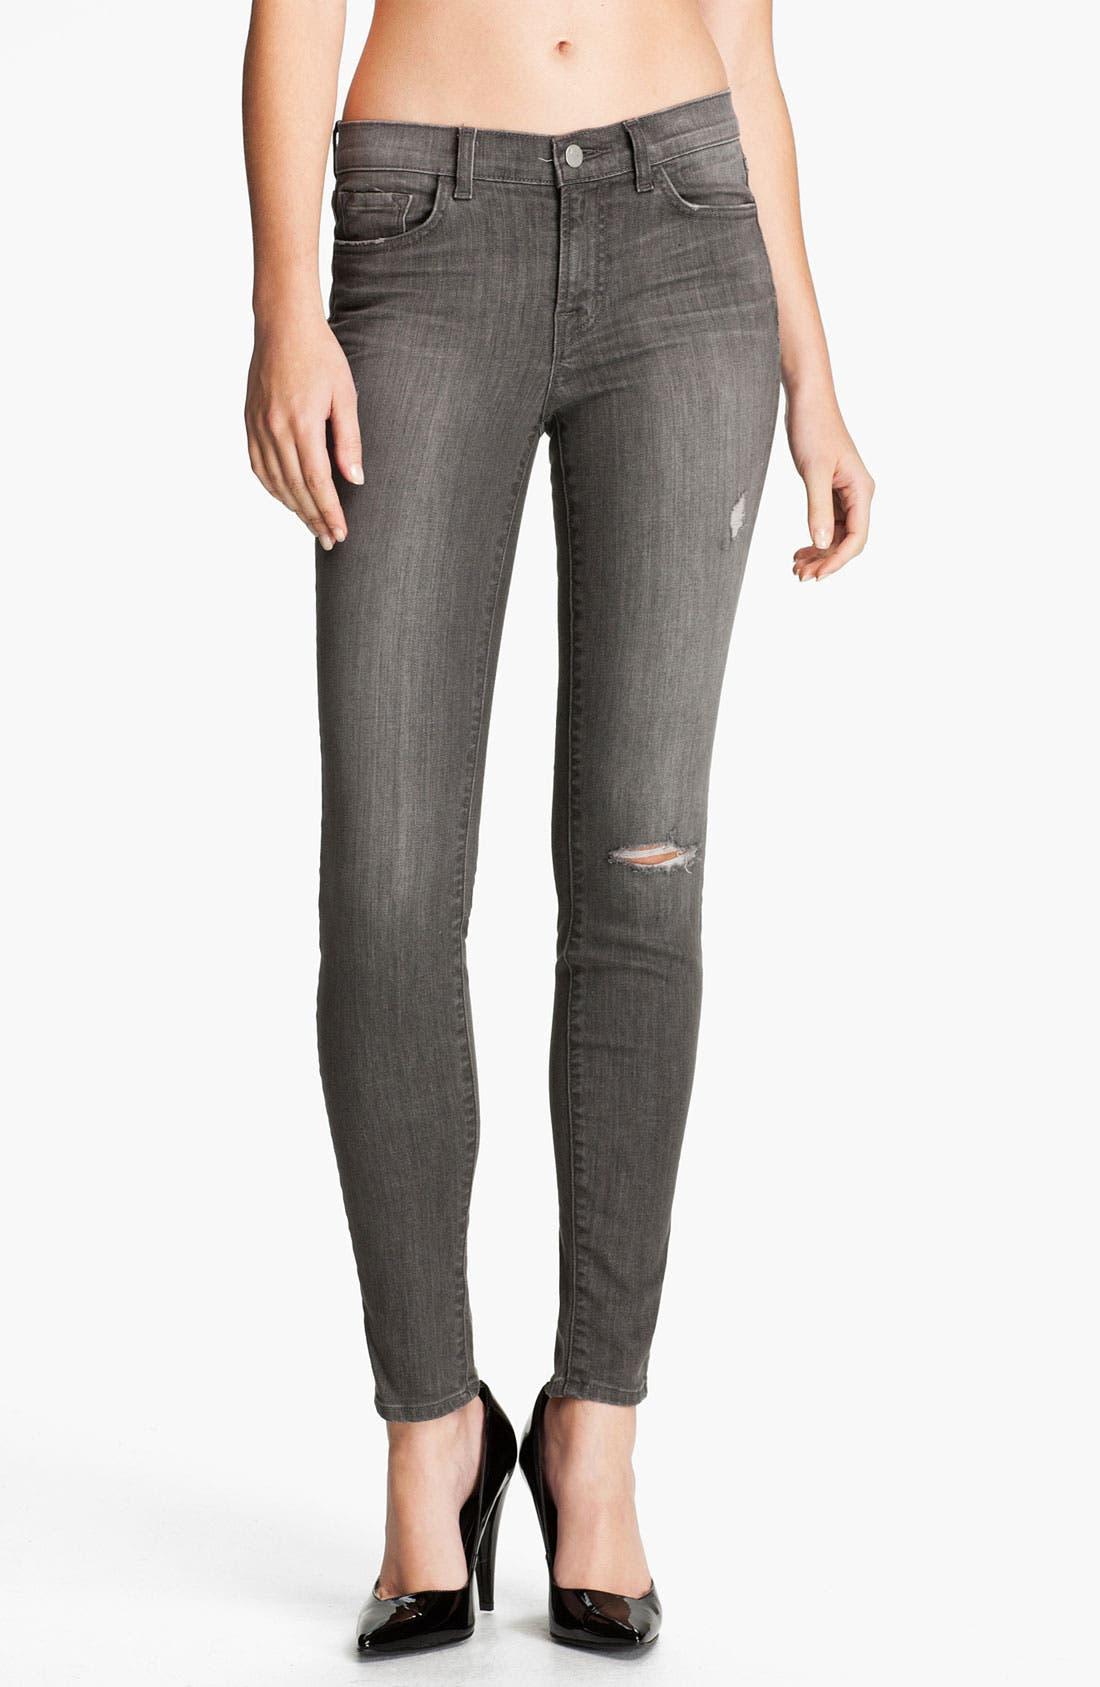 Alternate Image 1 Selected - J Brand Skinny Stretch Ankle Jeans